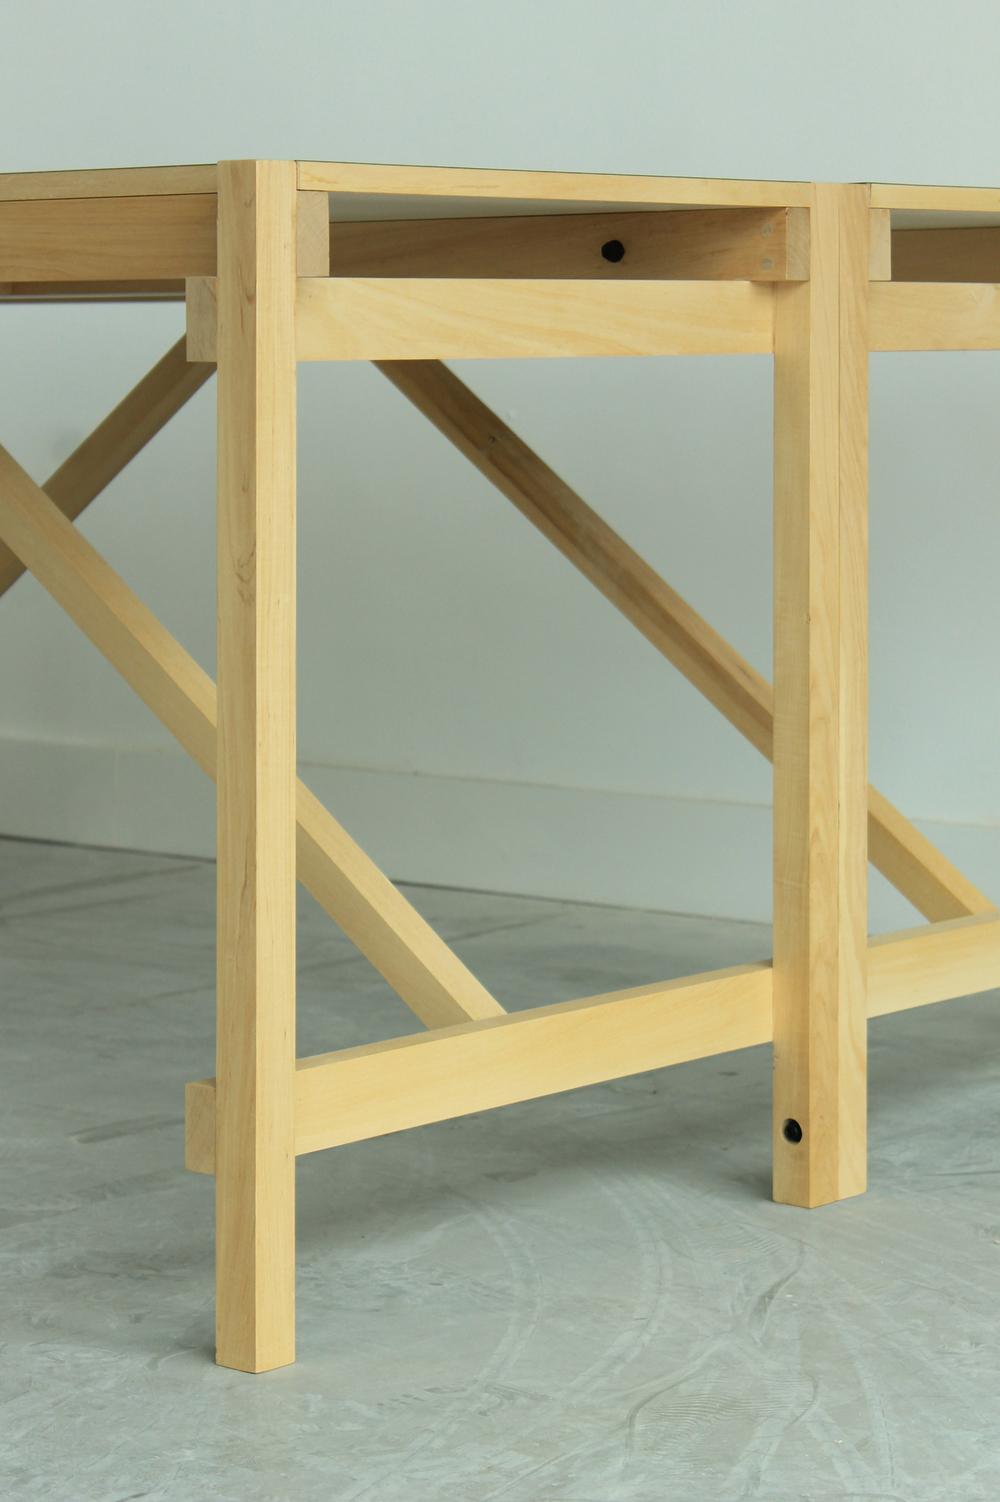 MM1700 | MM2000   Estructura de madera maciza de guatambú. Sistema de ensamble con bandeja intermedia.  Dimensiones: - 1700 x 850 x 600  Valor $16640-. + I.V.A.  - 2000 x 850 x 700  Valor $18720-. + I.V.A.    Material de tabla: mármol/vidrio/formica